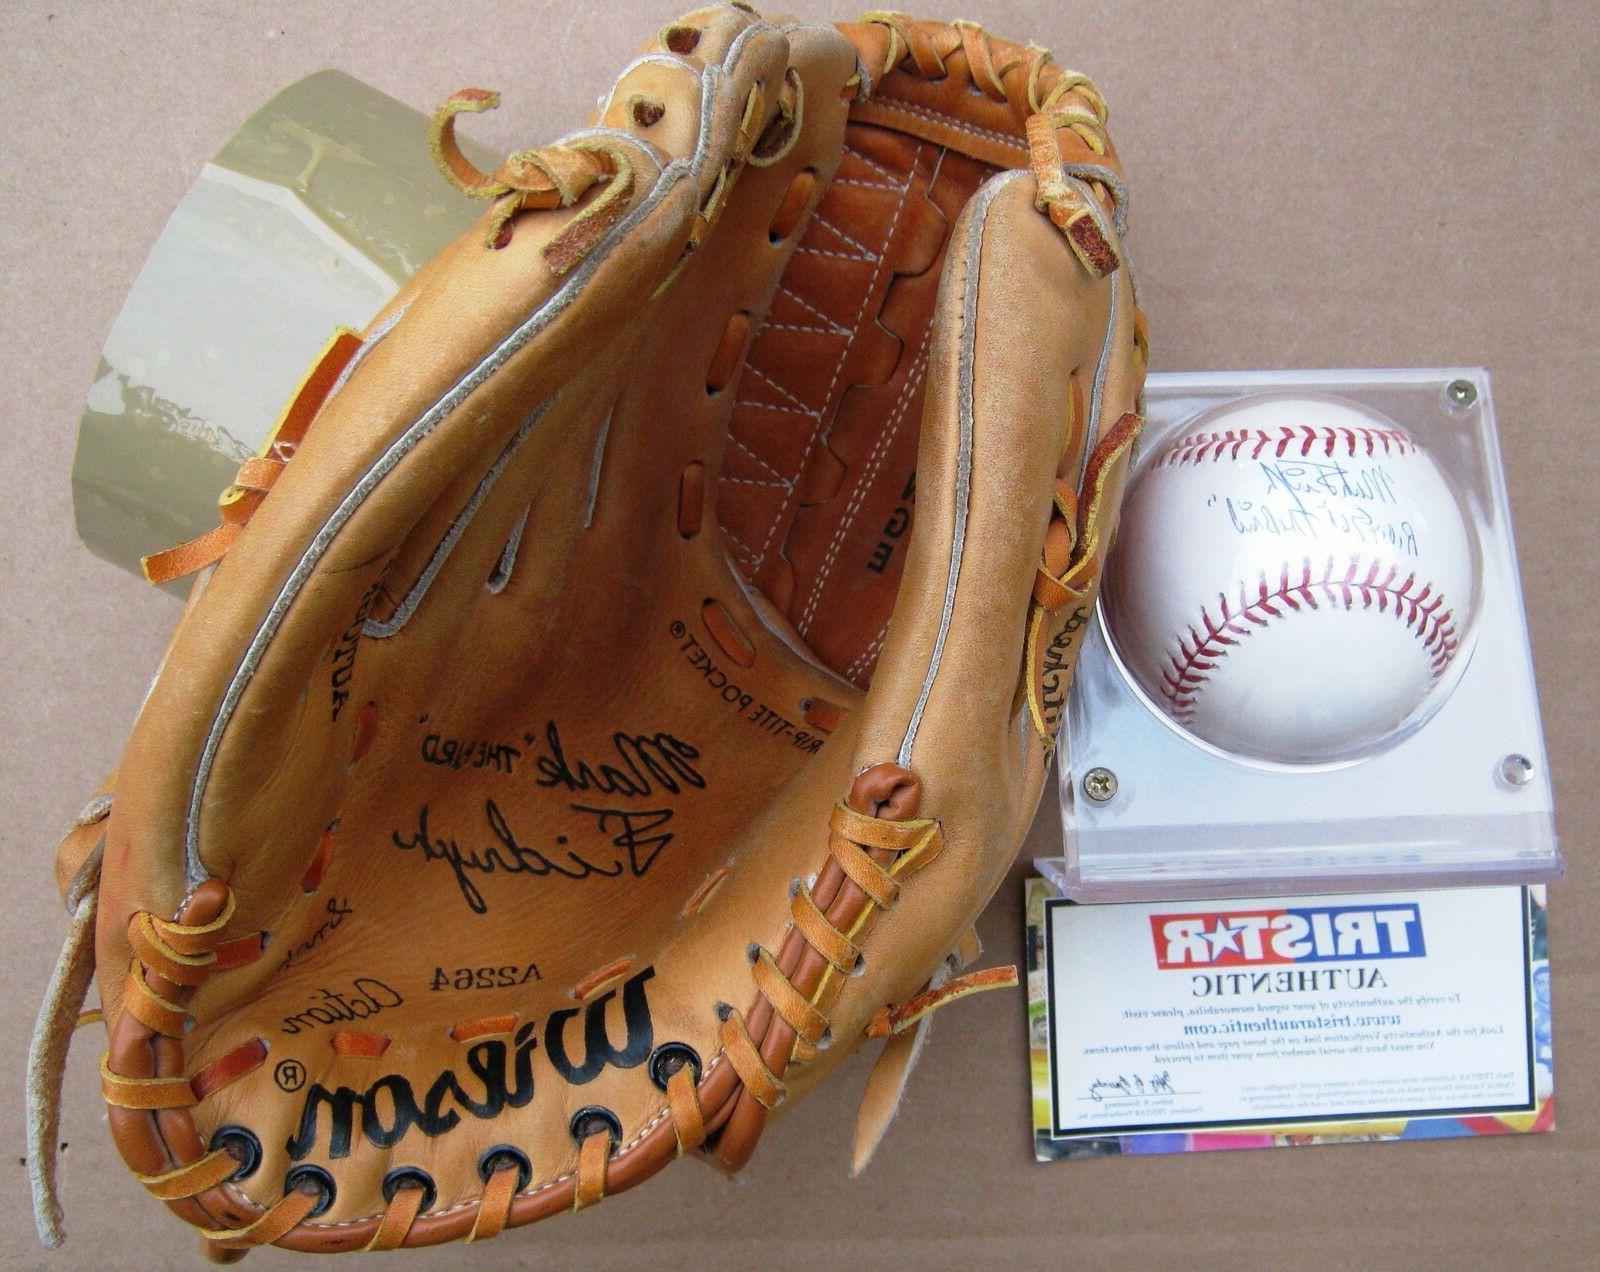 detroit tigers mark the bird fidrych glove